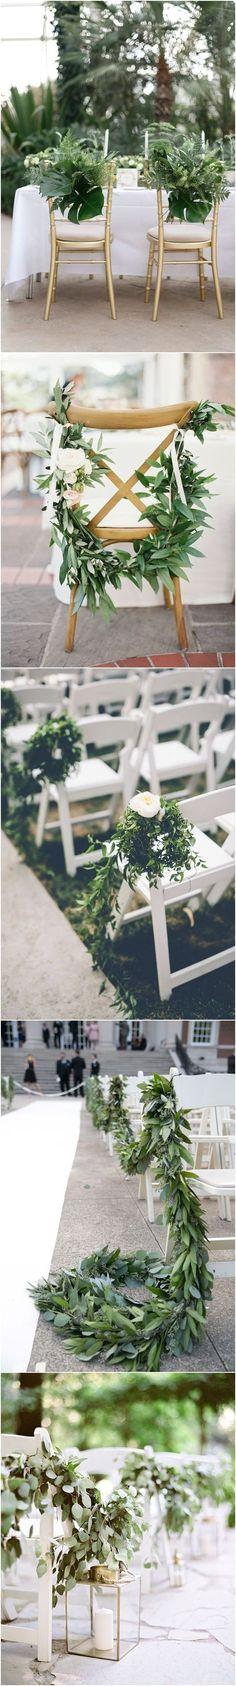 Greenery wedding decor ideas / http://www.deerpearlflowers.com/greenery-wedding-decor-ideas/ #weddingbackdrops #weddingdecorations